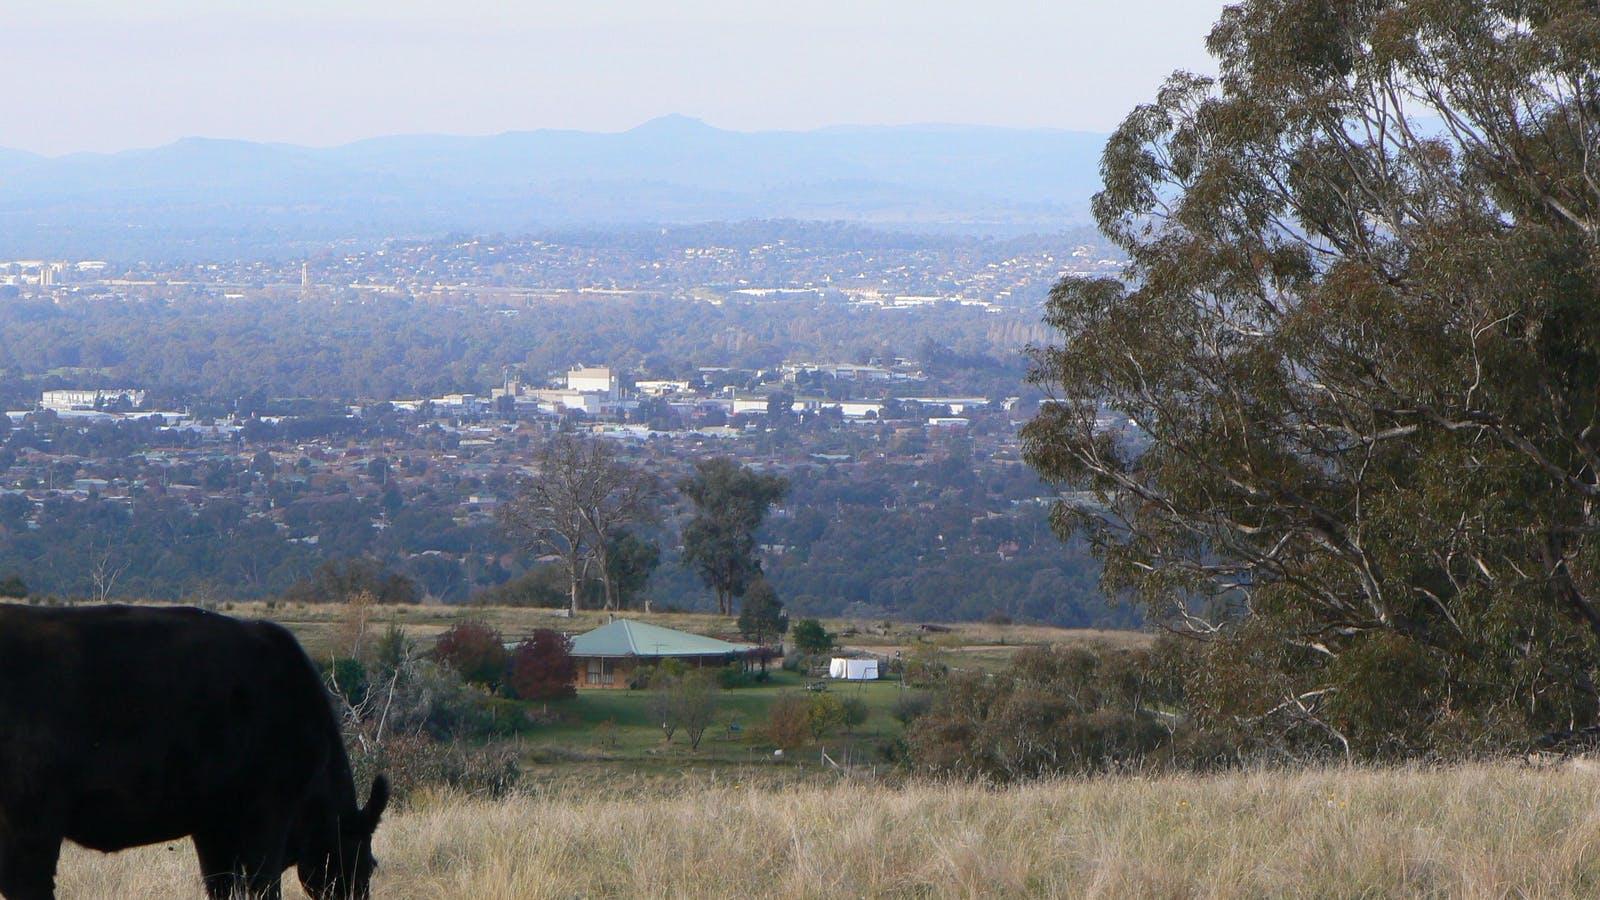 View overlooking Albury Wodonga from Gaddleen Grove Property, Wodonga